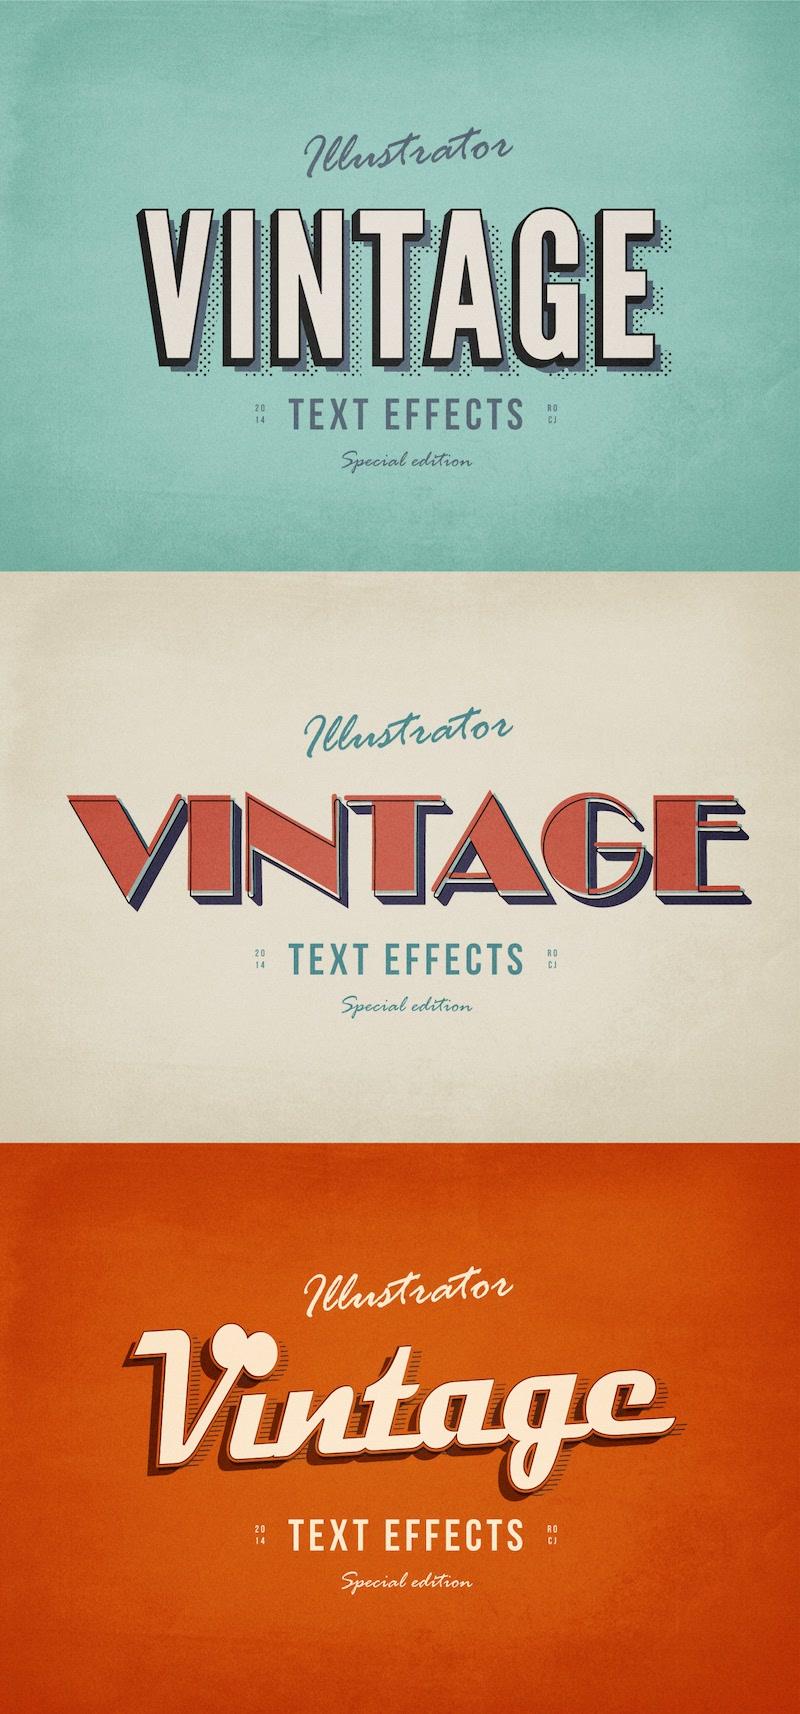 3 Illustrator text effects